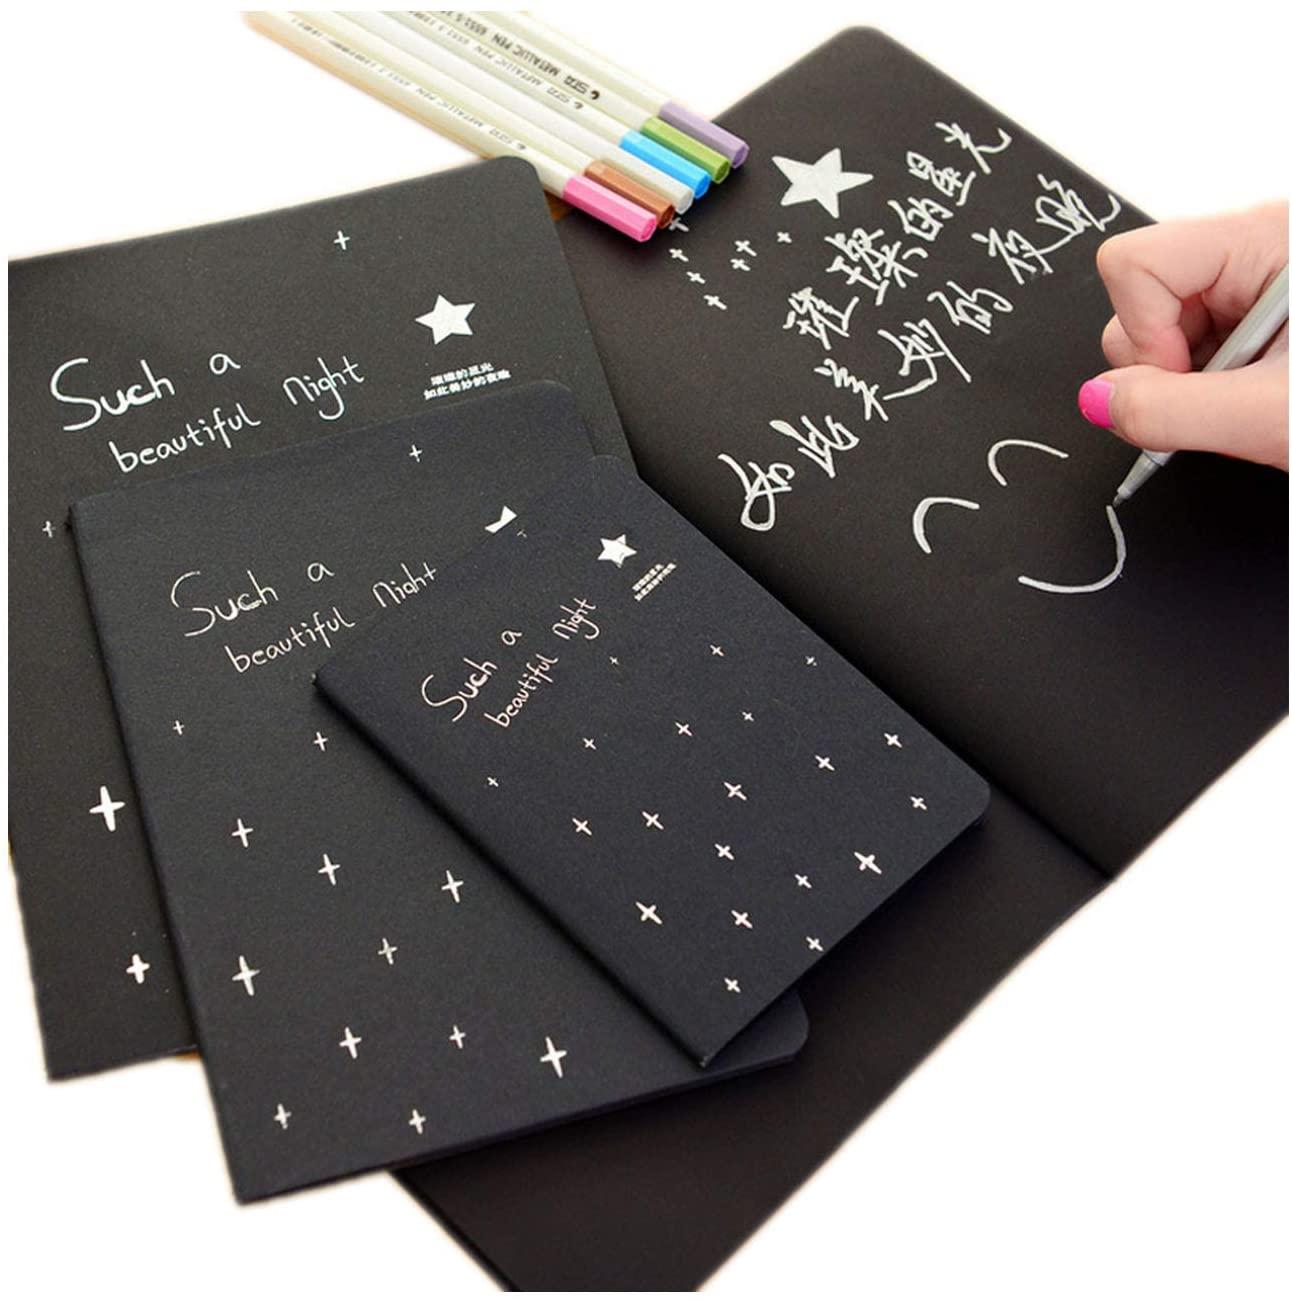 Notebook Diary Black Paper Notepad 16k 32k 56k Sketch Graffiti Notebook Office School Stationery Gifts,A5